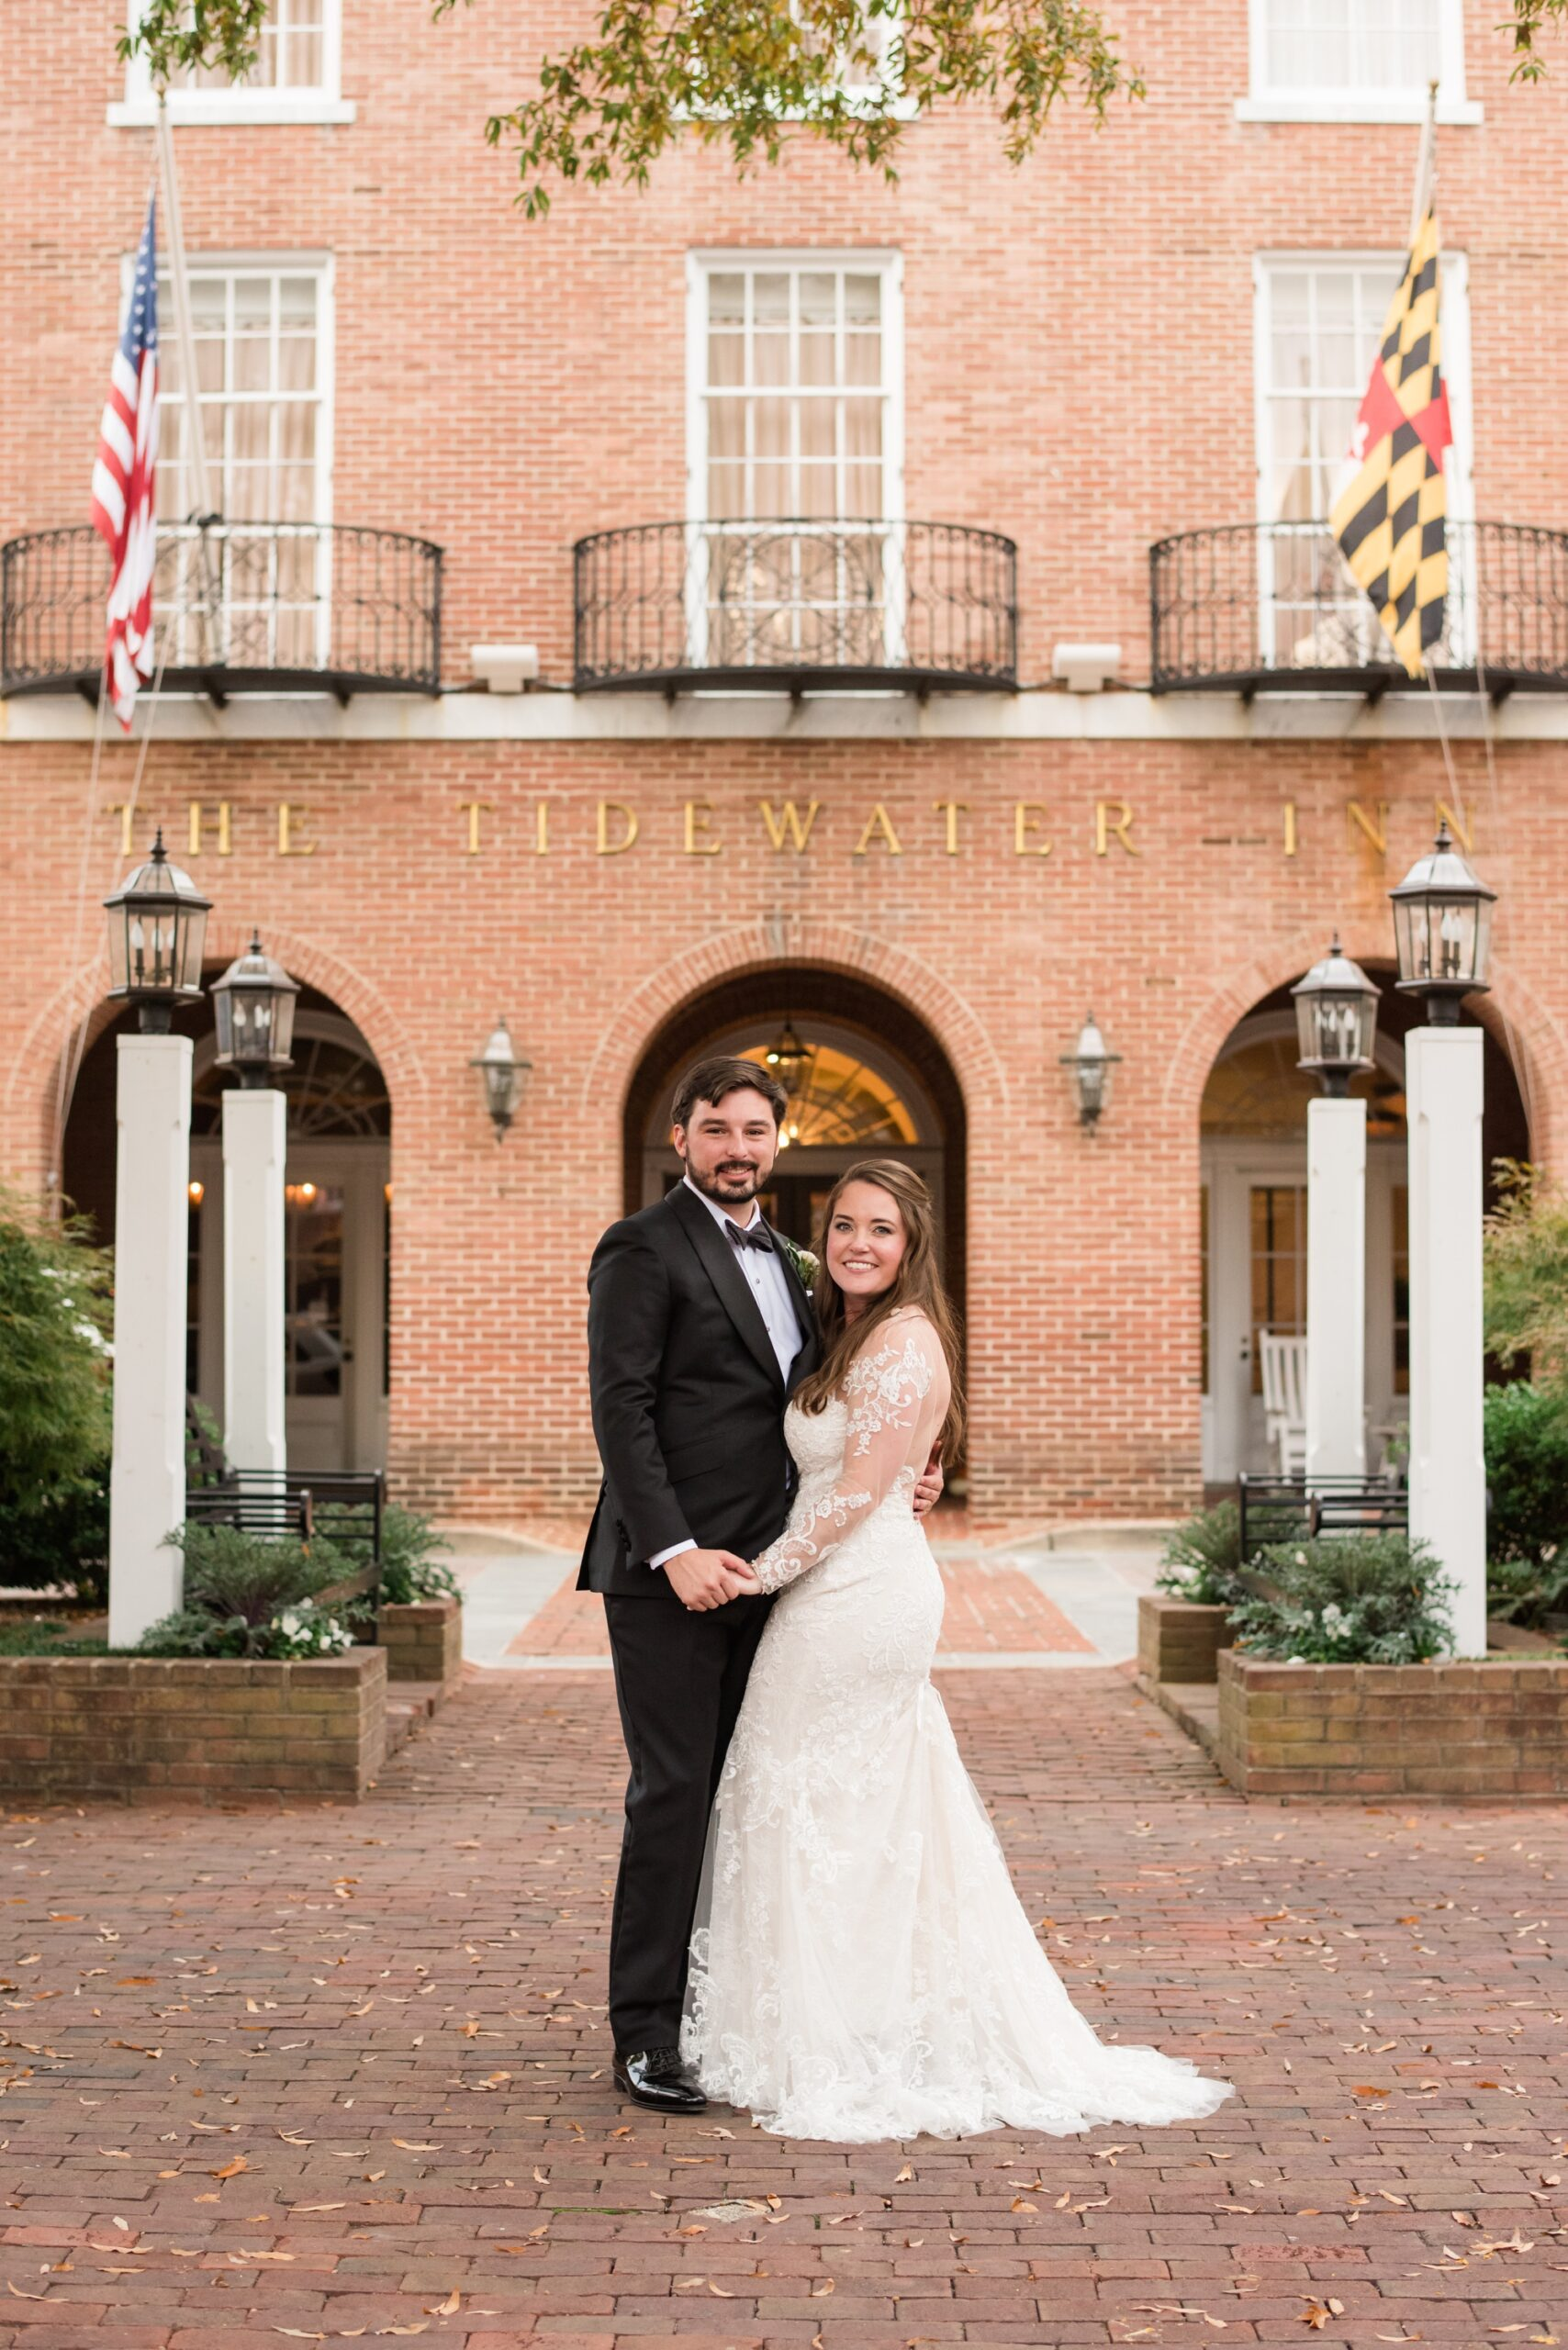 Tidewater Inn wedding photography